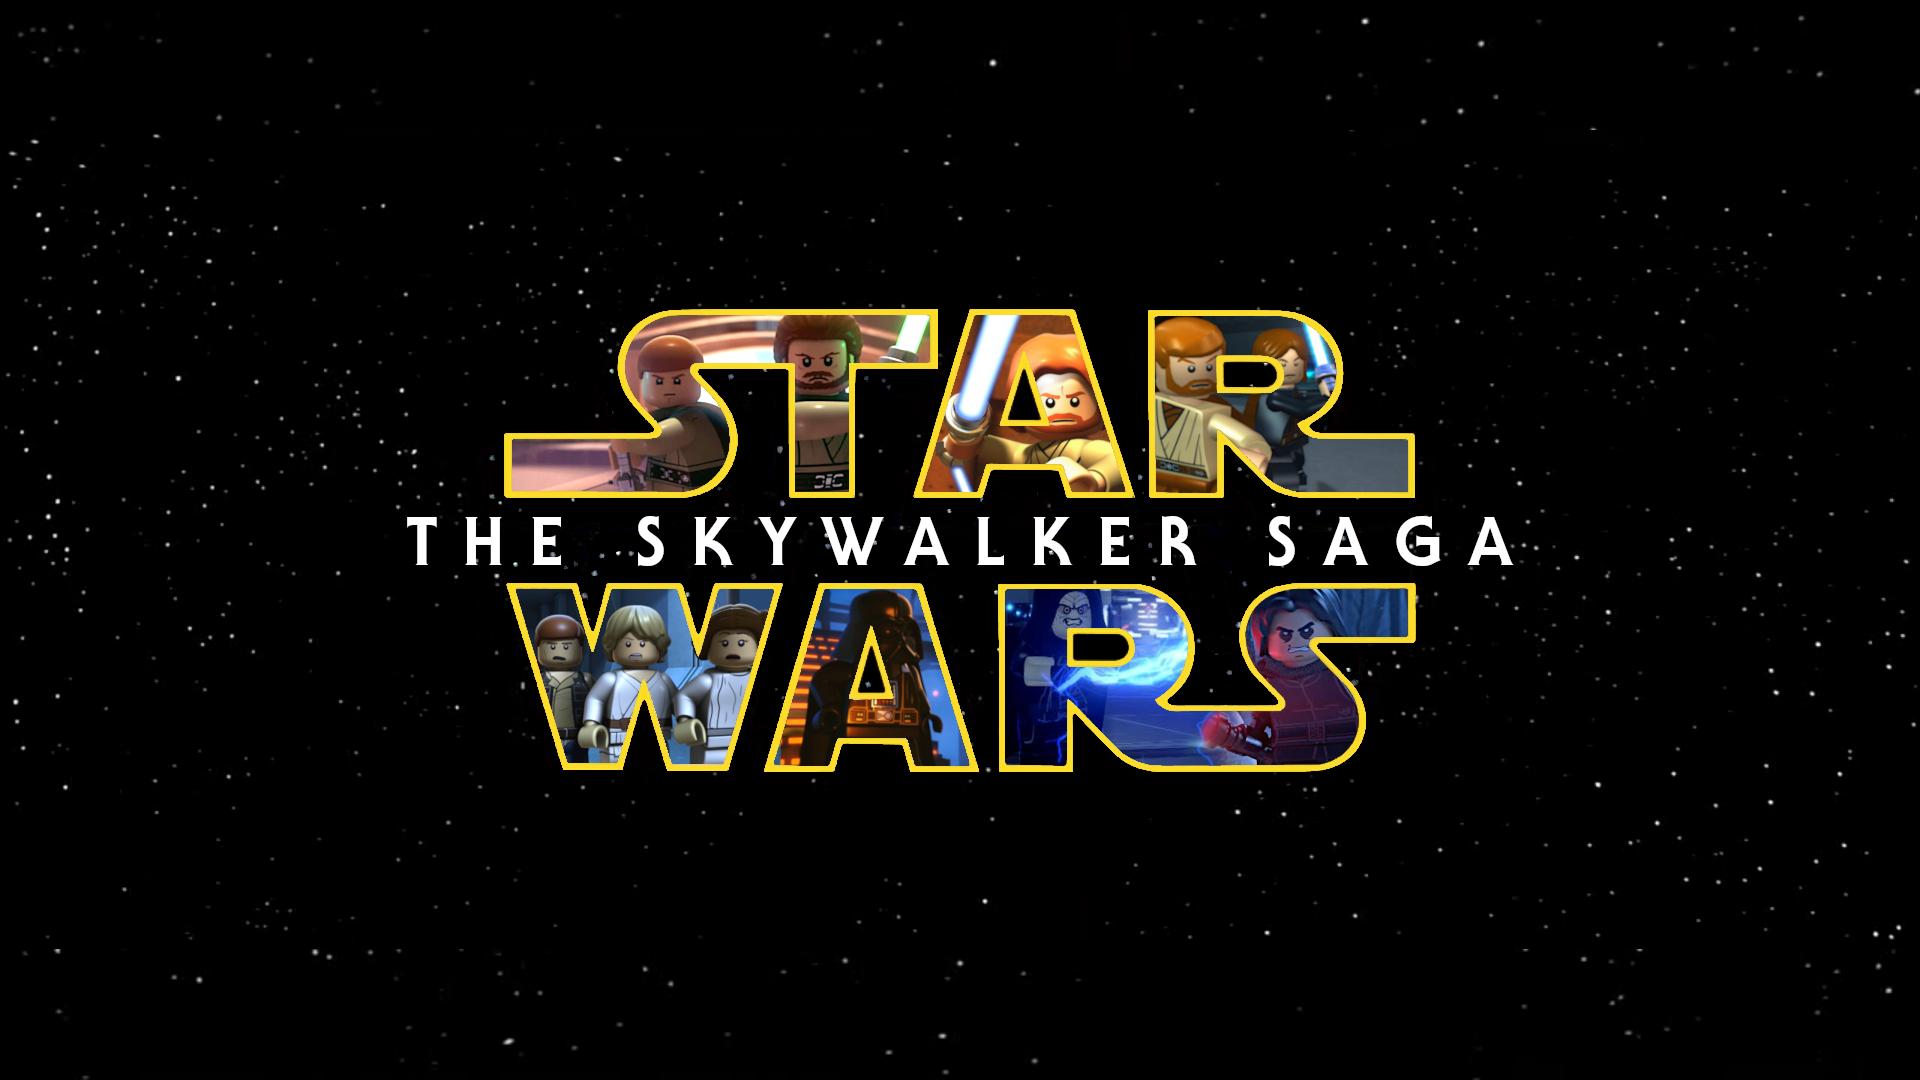 Lego Star Wars The Skywalker Saga Wallpapers Wallpaper Cave